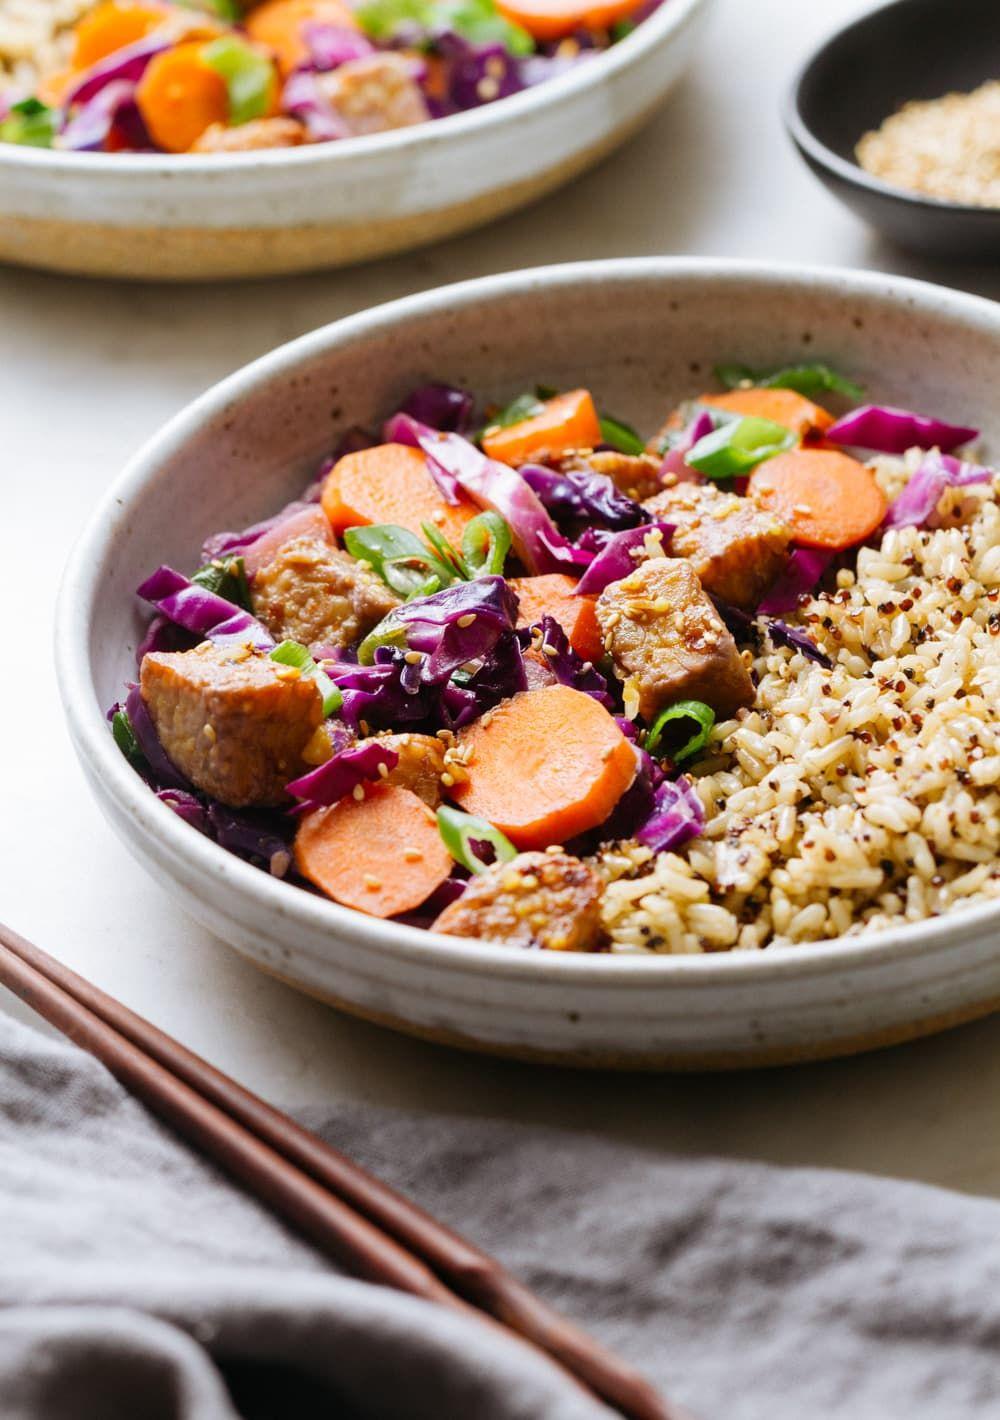 Mirin maple tempeh stir fry recipe this easy vegan